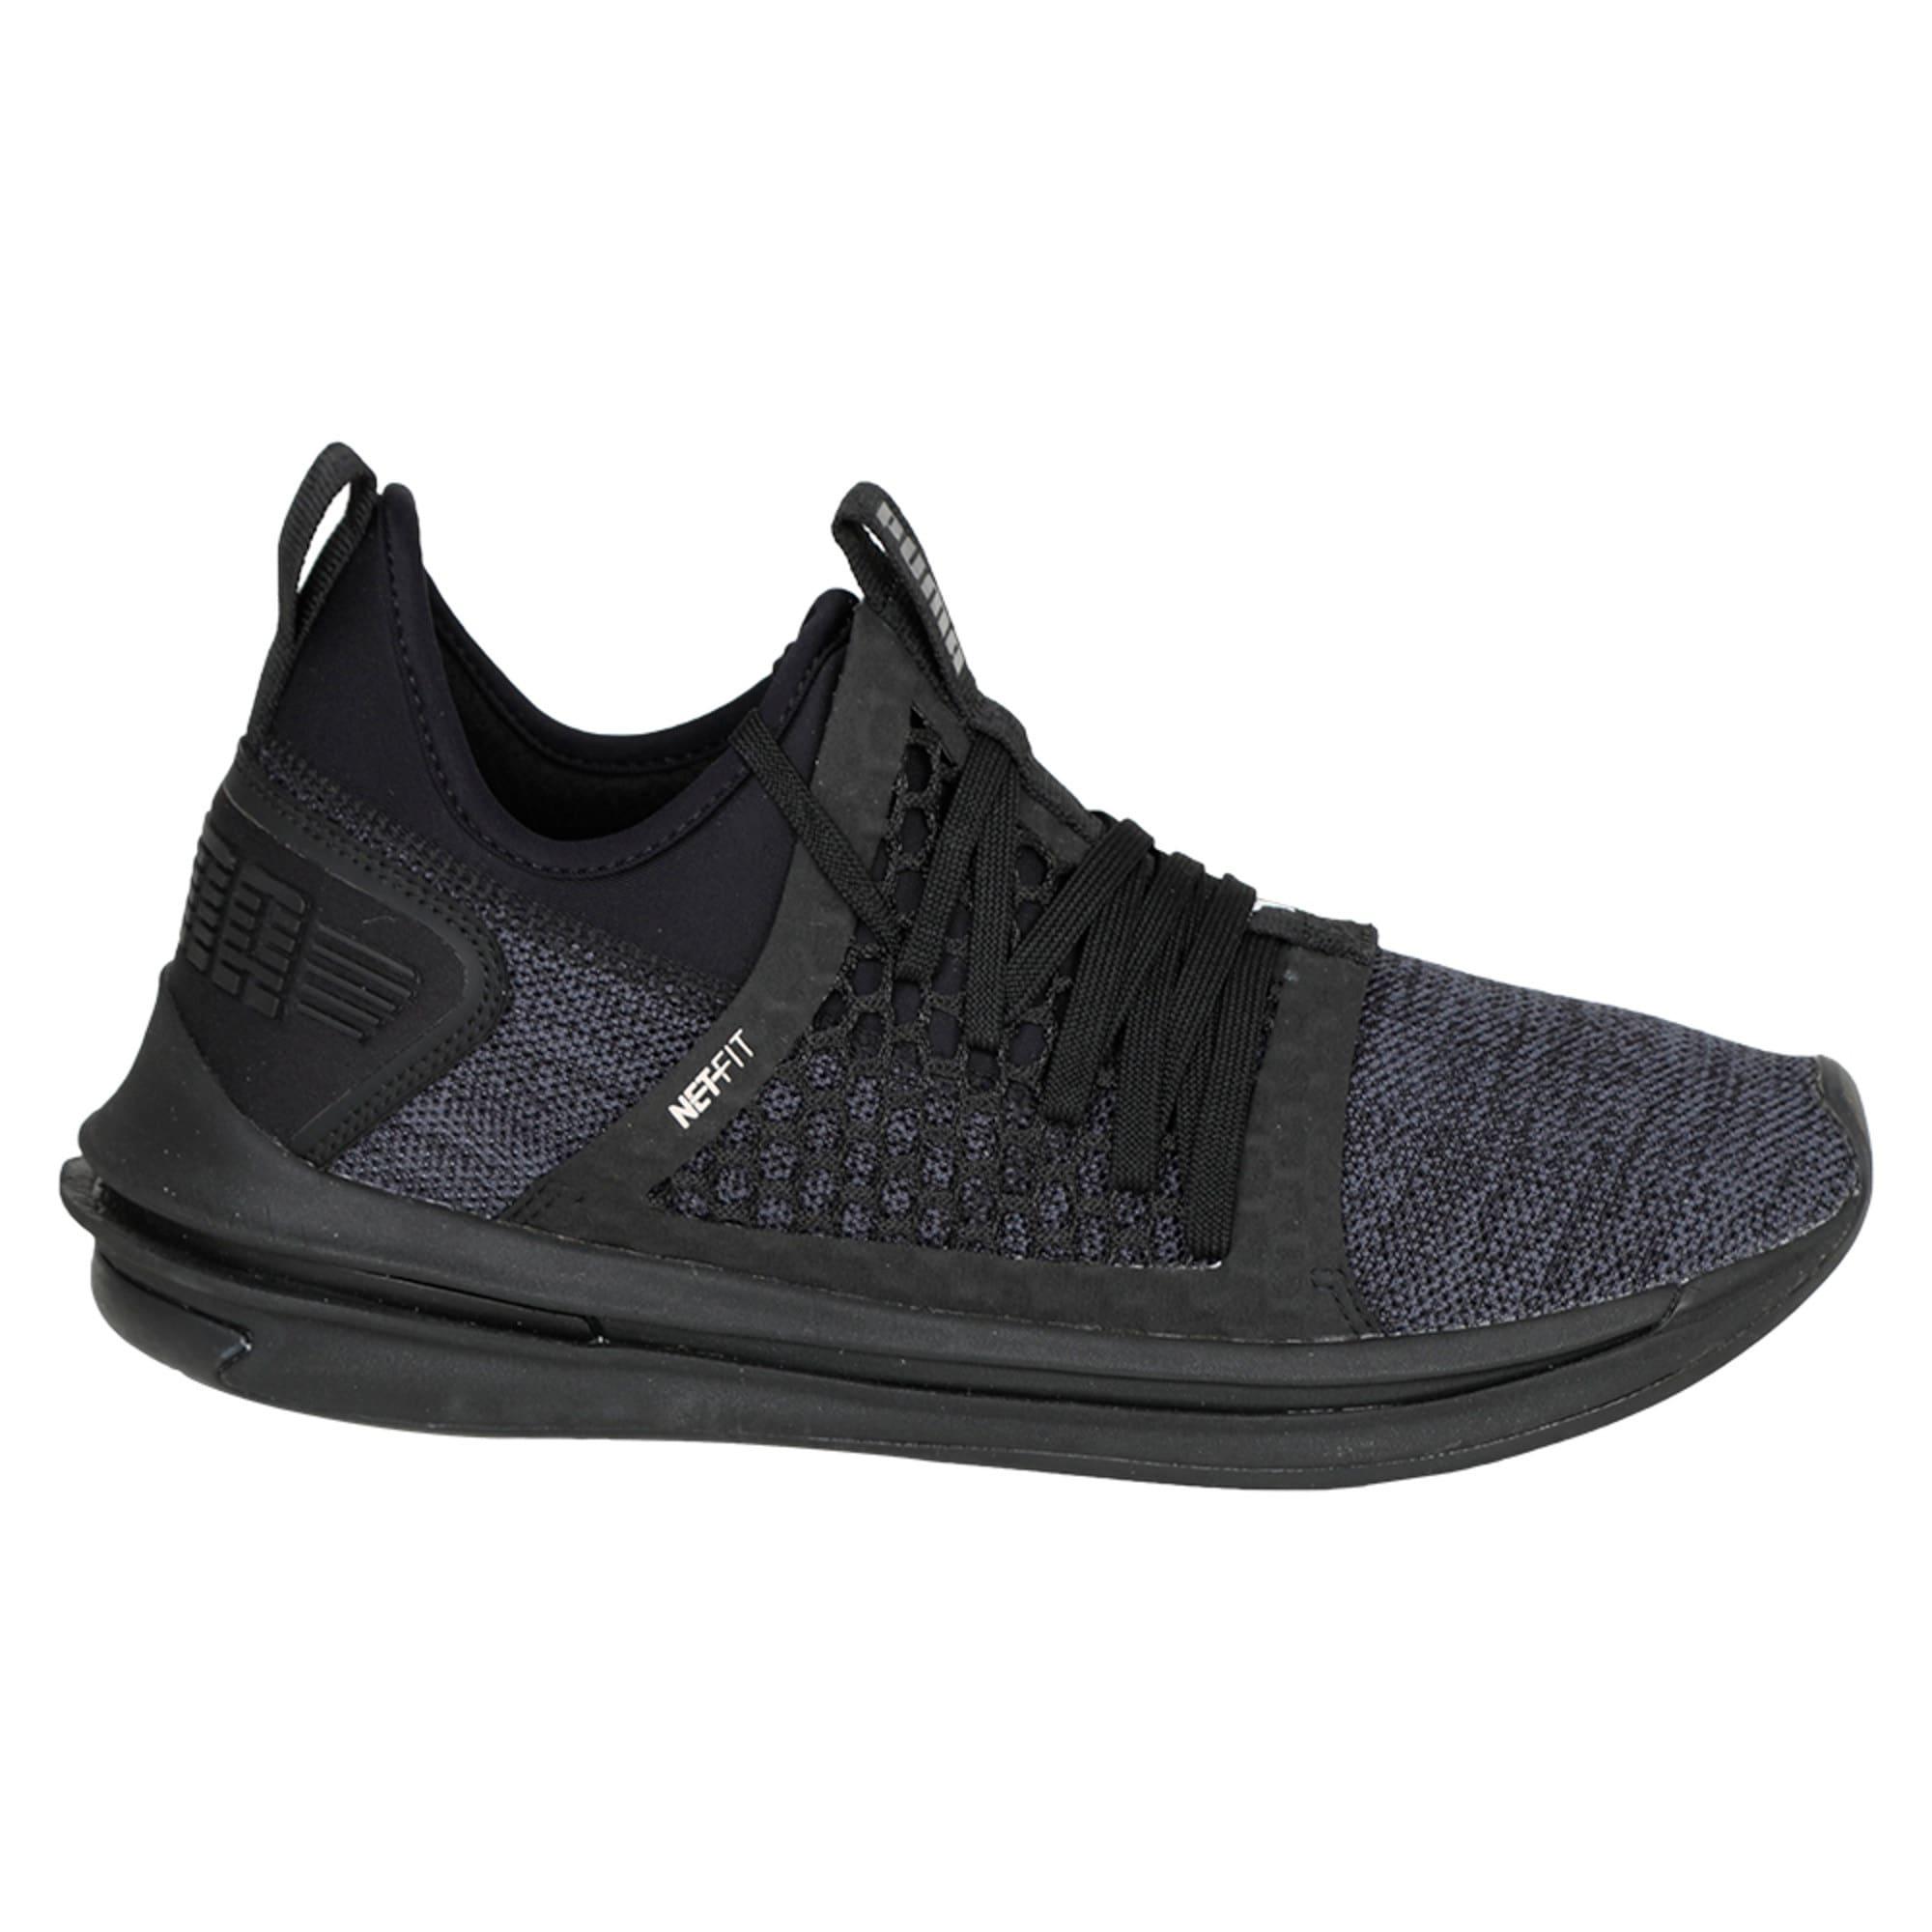 Thumbnail 5 of IGNITE Limitless SR NETFIT Men's Trainer Shoes, Puma Black, medium-IND